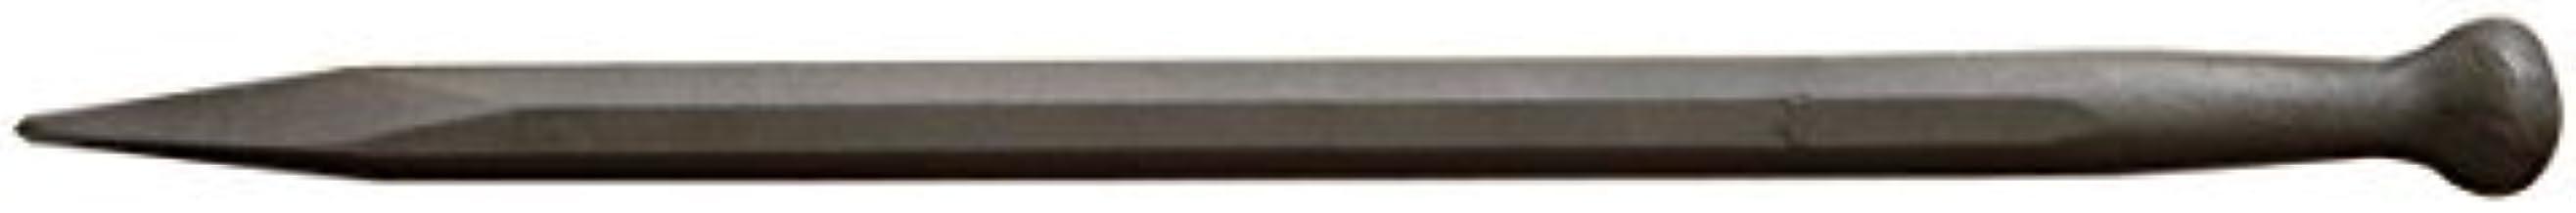 Rennsteig 340 200 0 Polished Masons Chisel Gold 200 mm